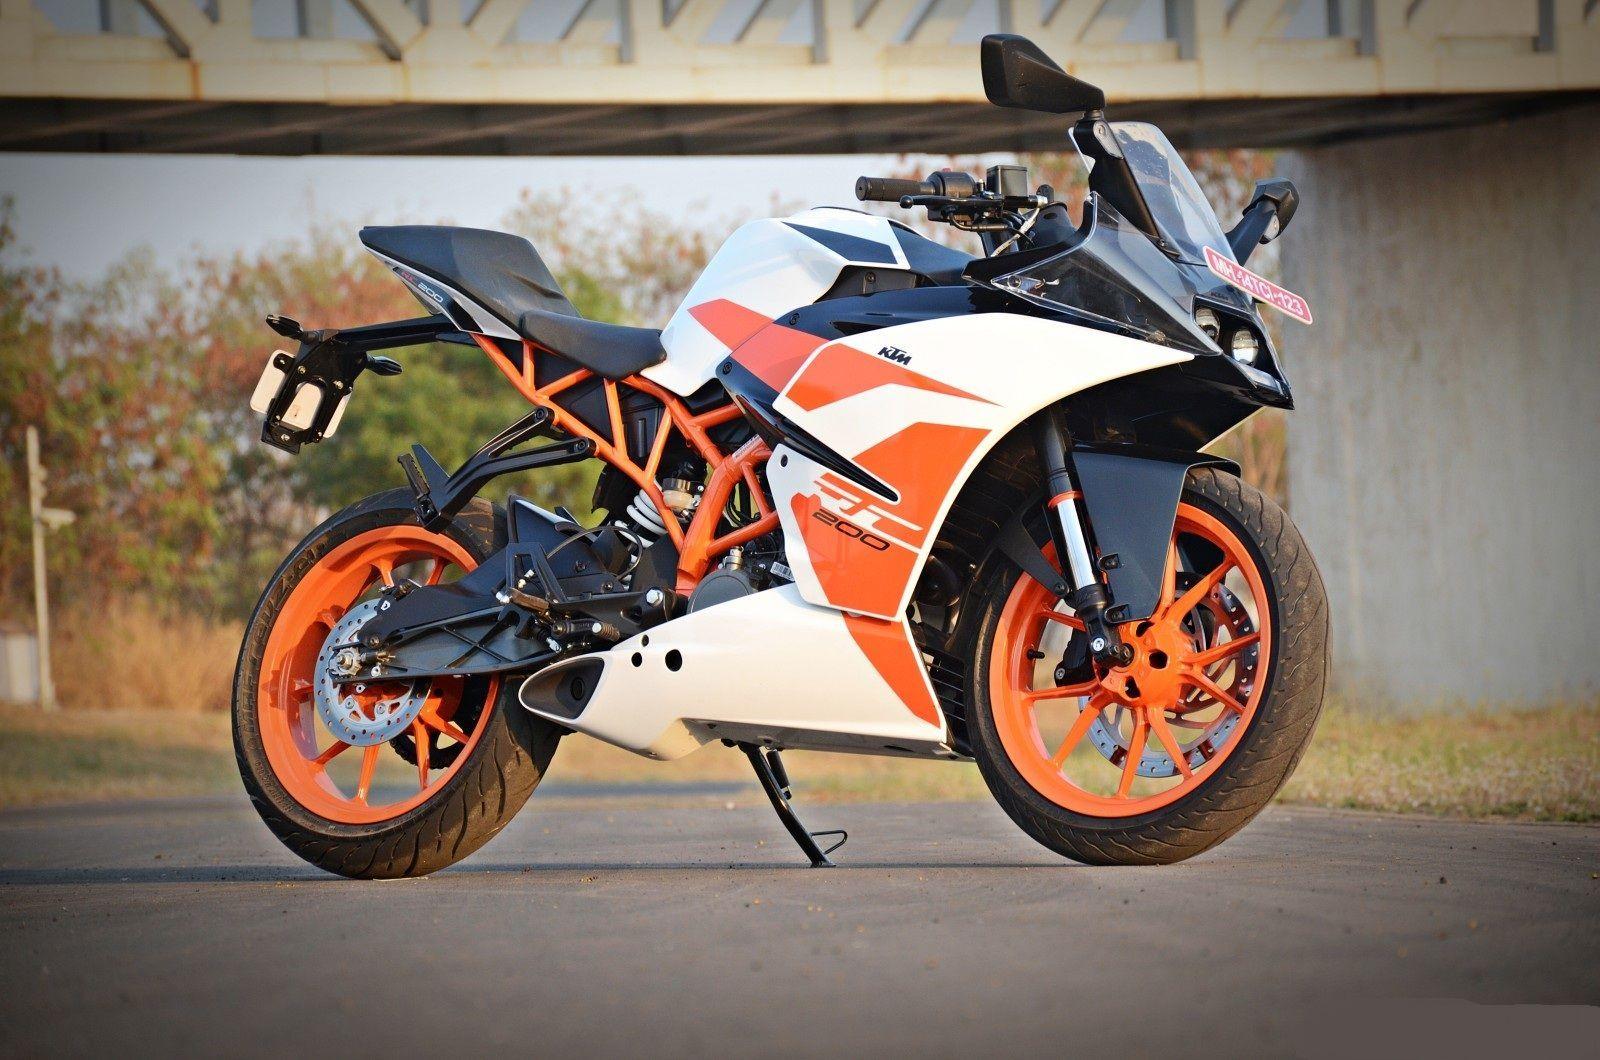 Pin On Ktm Motorcycles